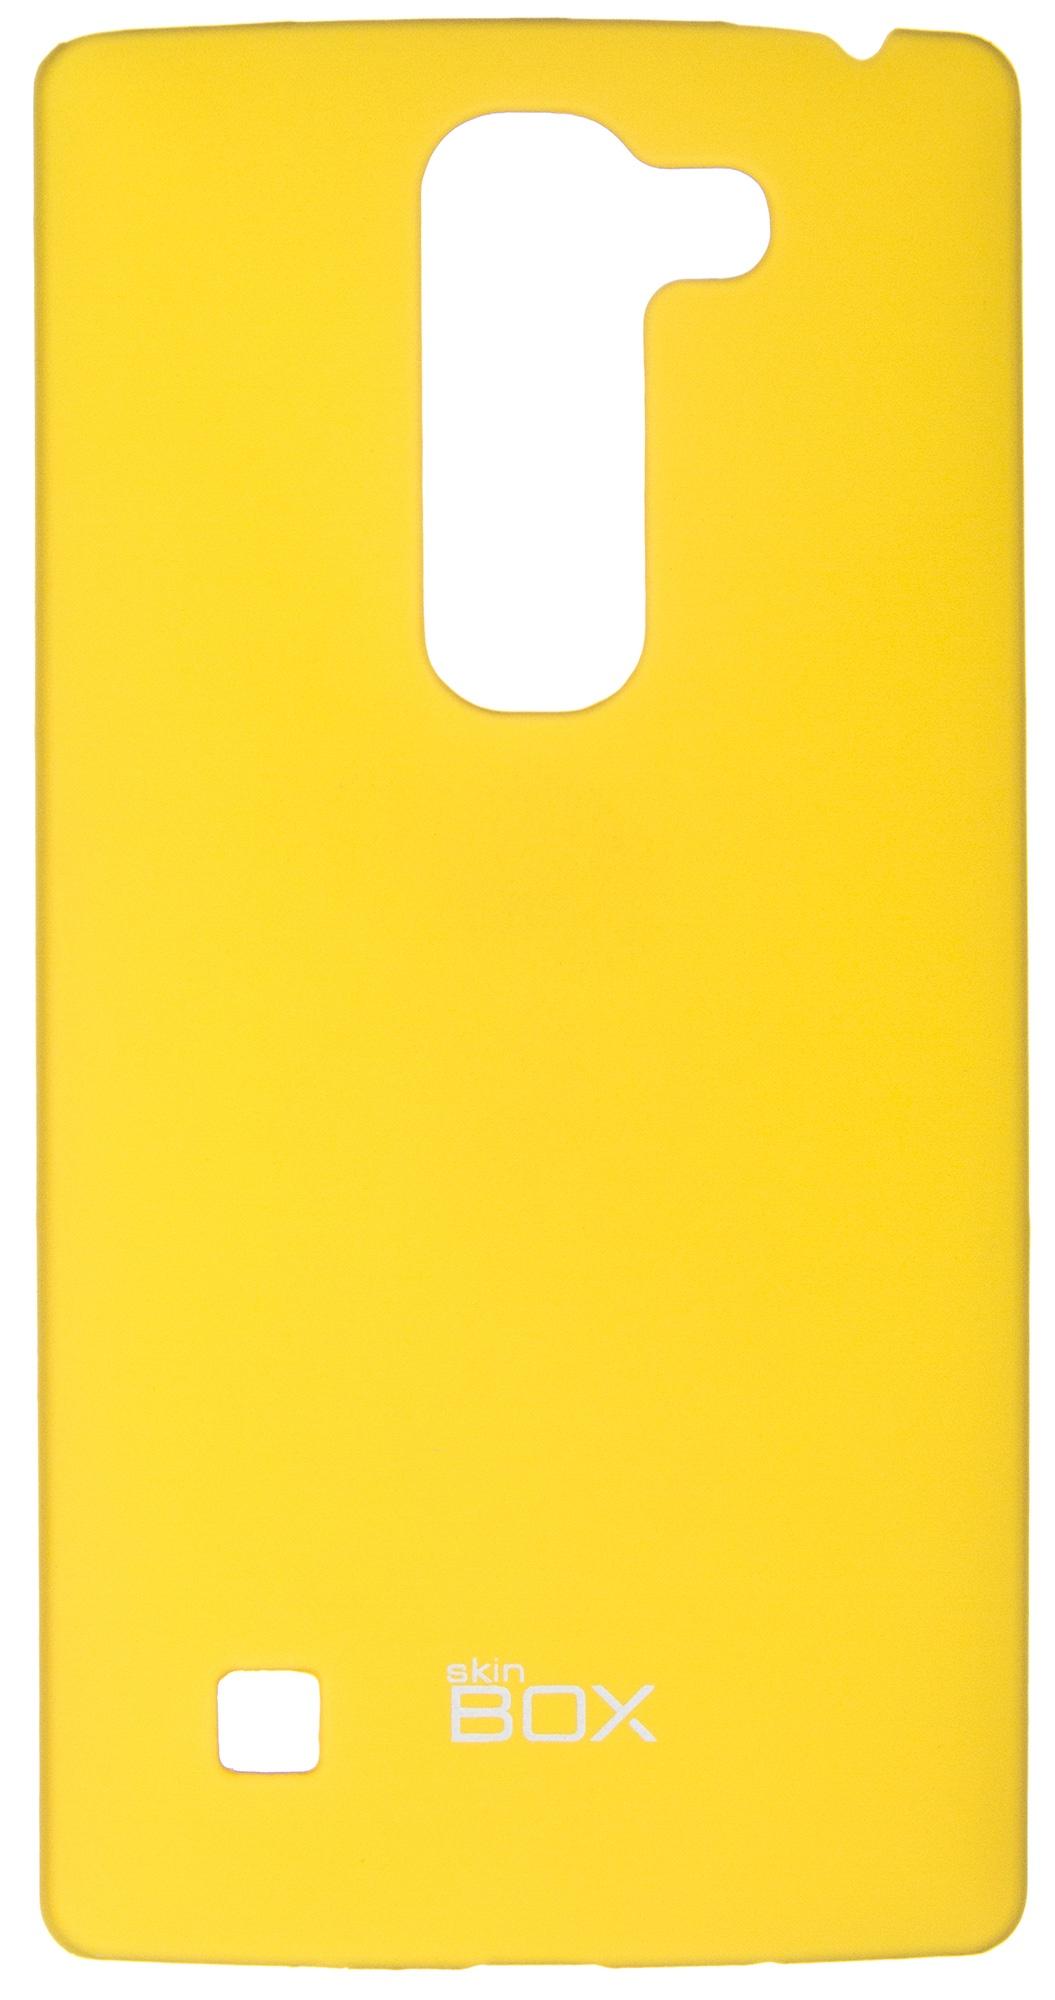 Накладка skinBOX для LG Spirit, 2000000073965, желтый